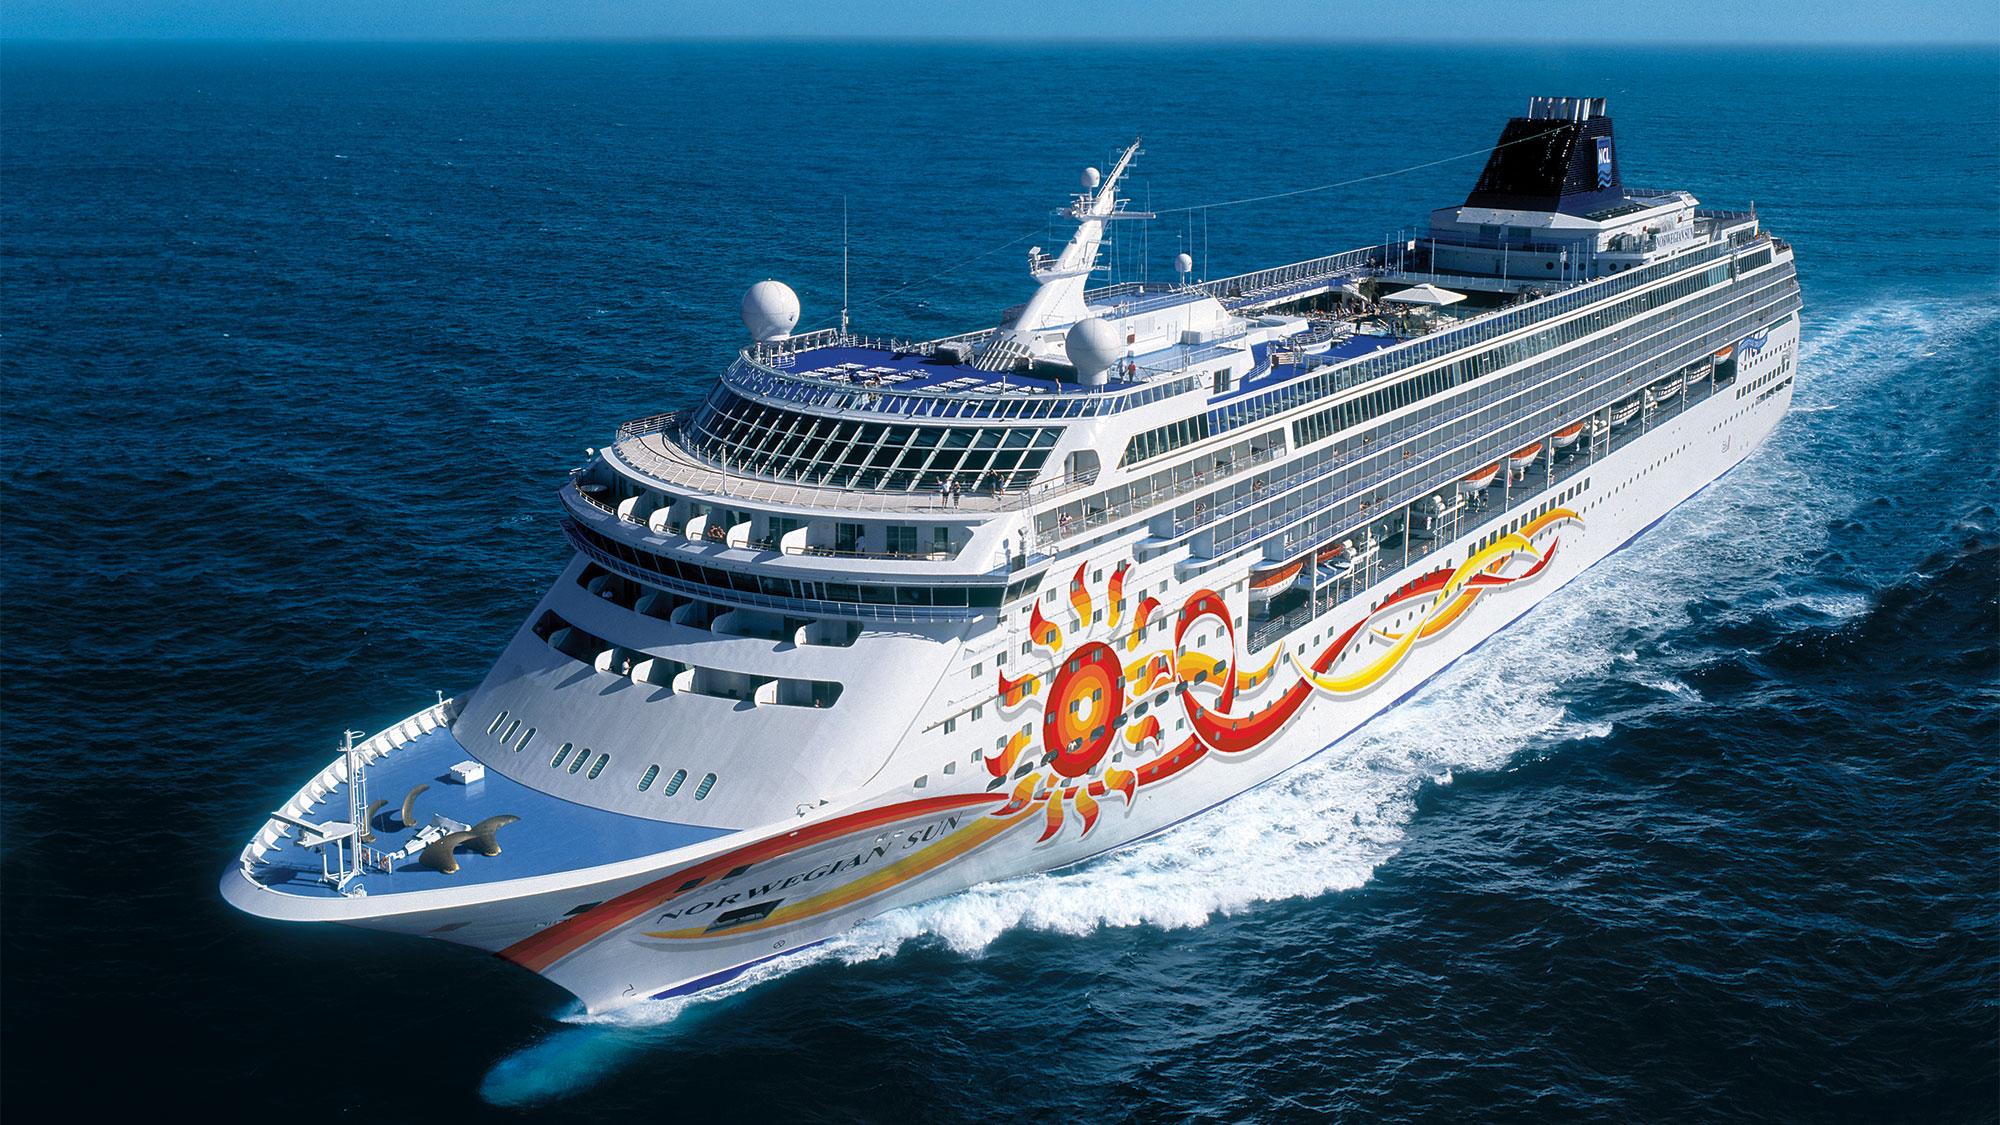 Norwegian Sun To Sail Short Cuba Cruises From Port Canaveral - Cruise ships port canaveral